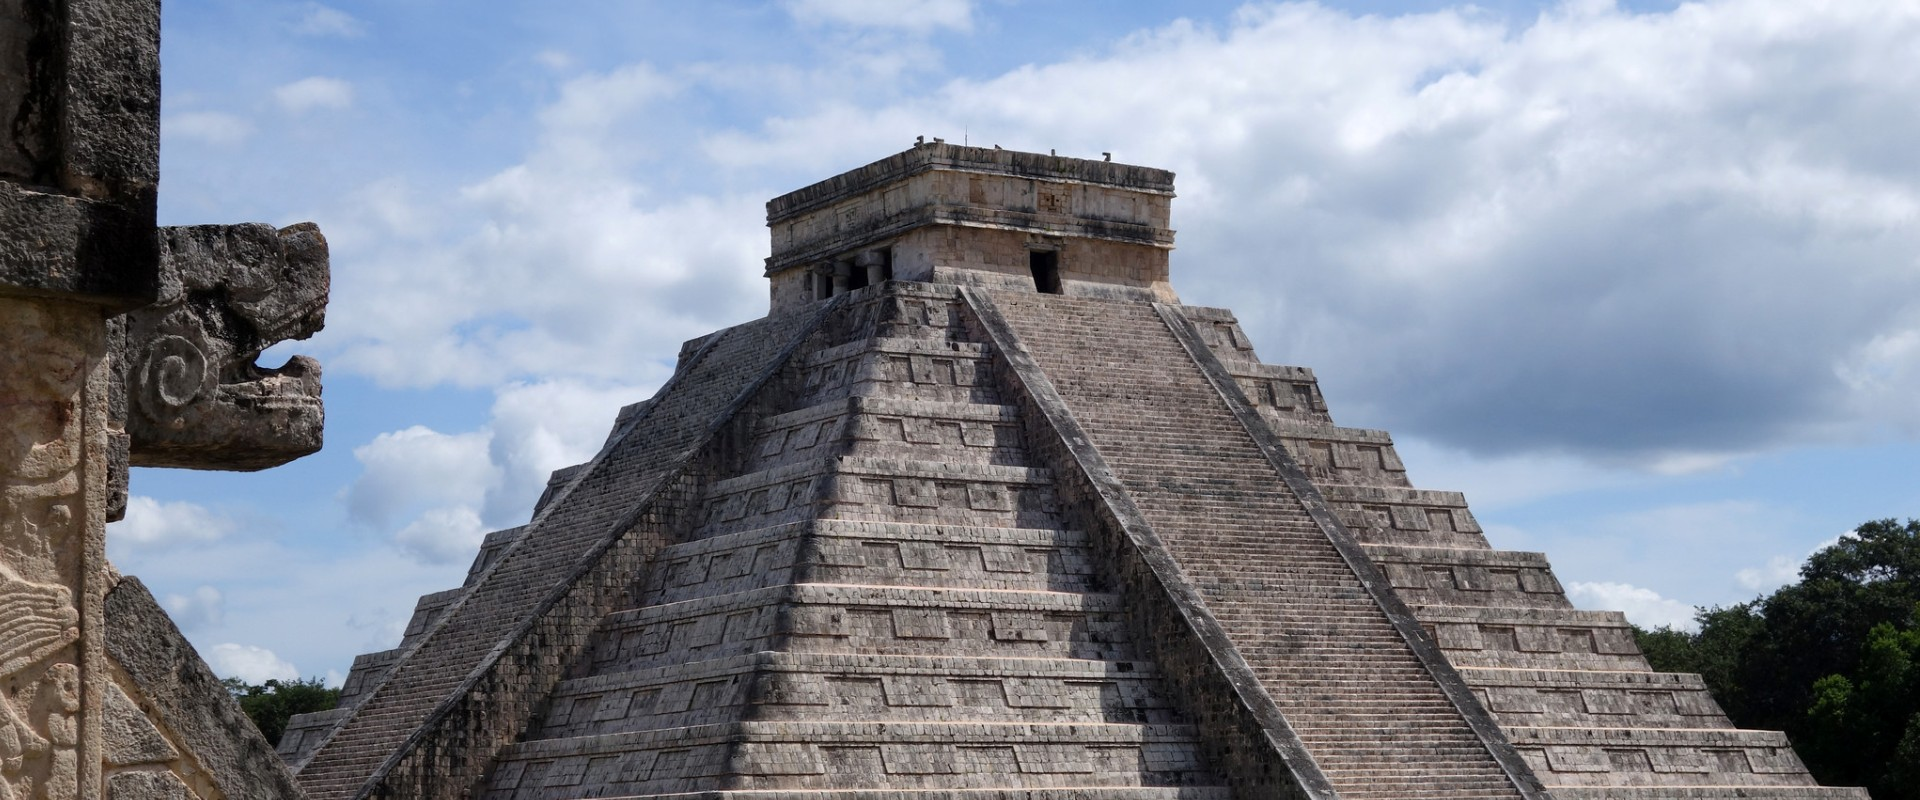 mexico_Chichén-Itzá